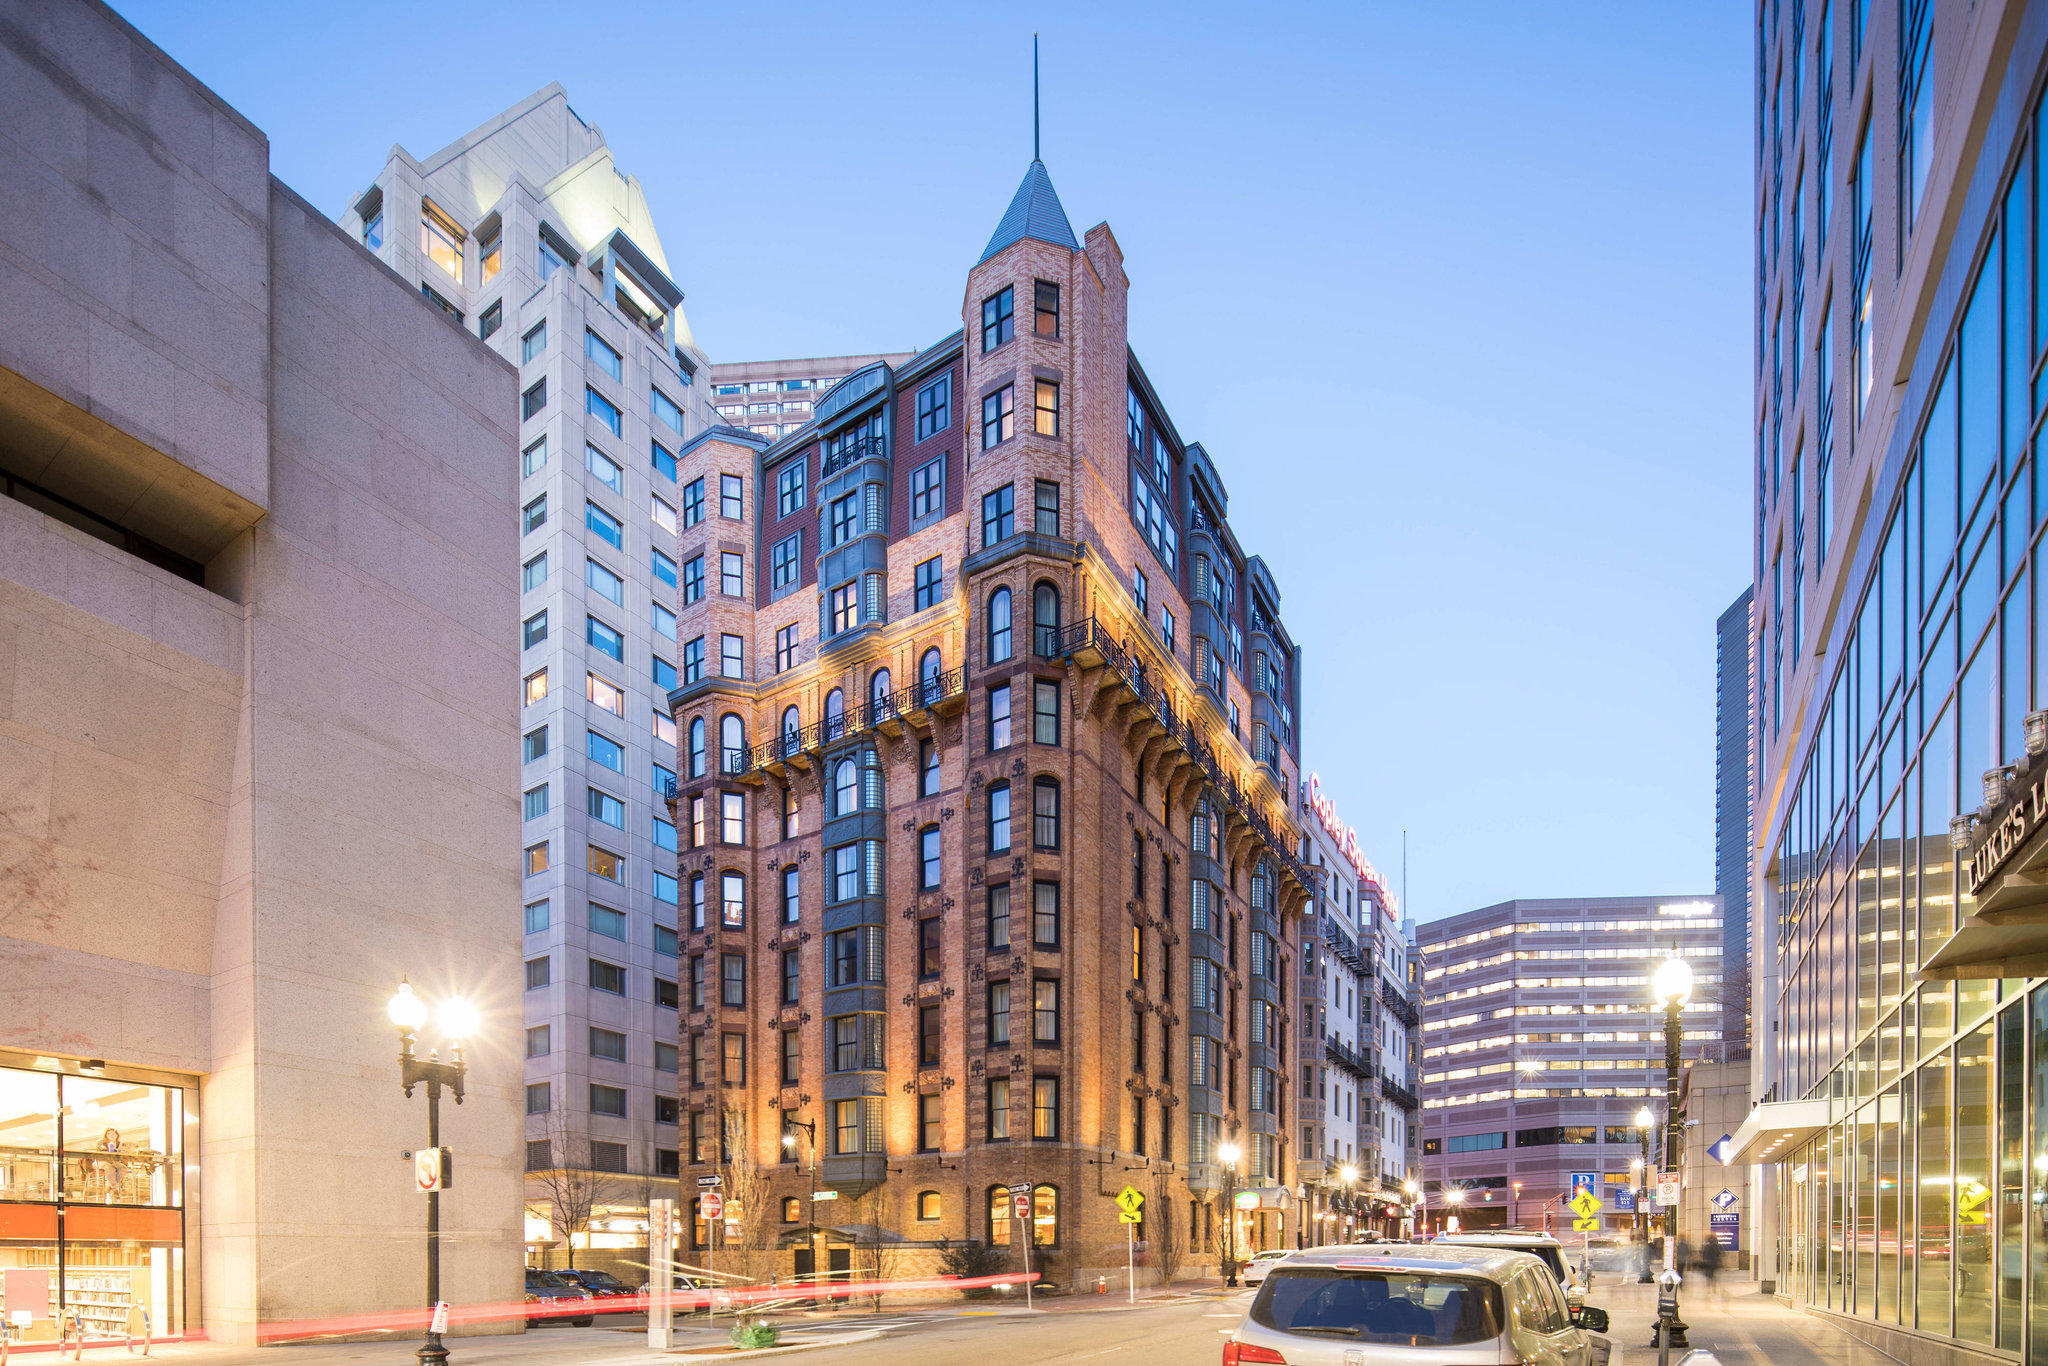 Courtyard by Marriott Boston Copley Square